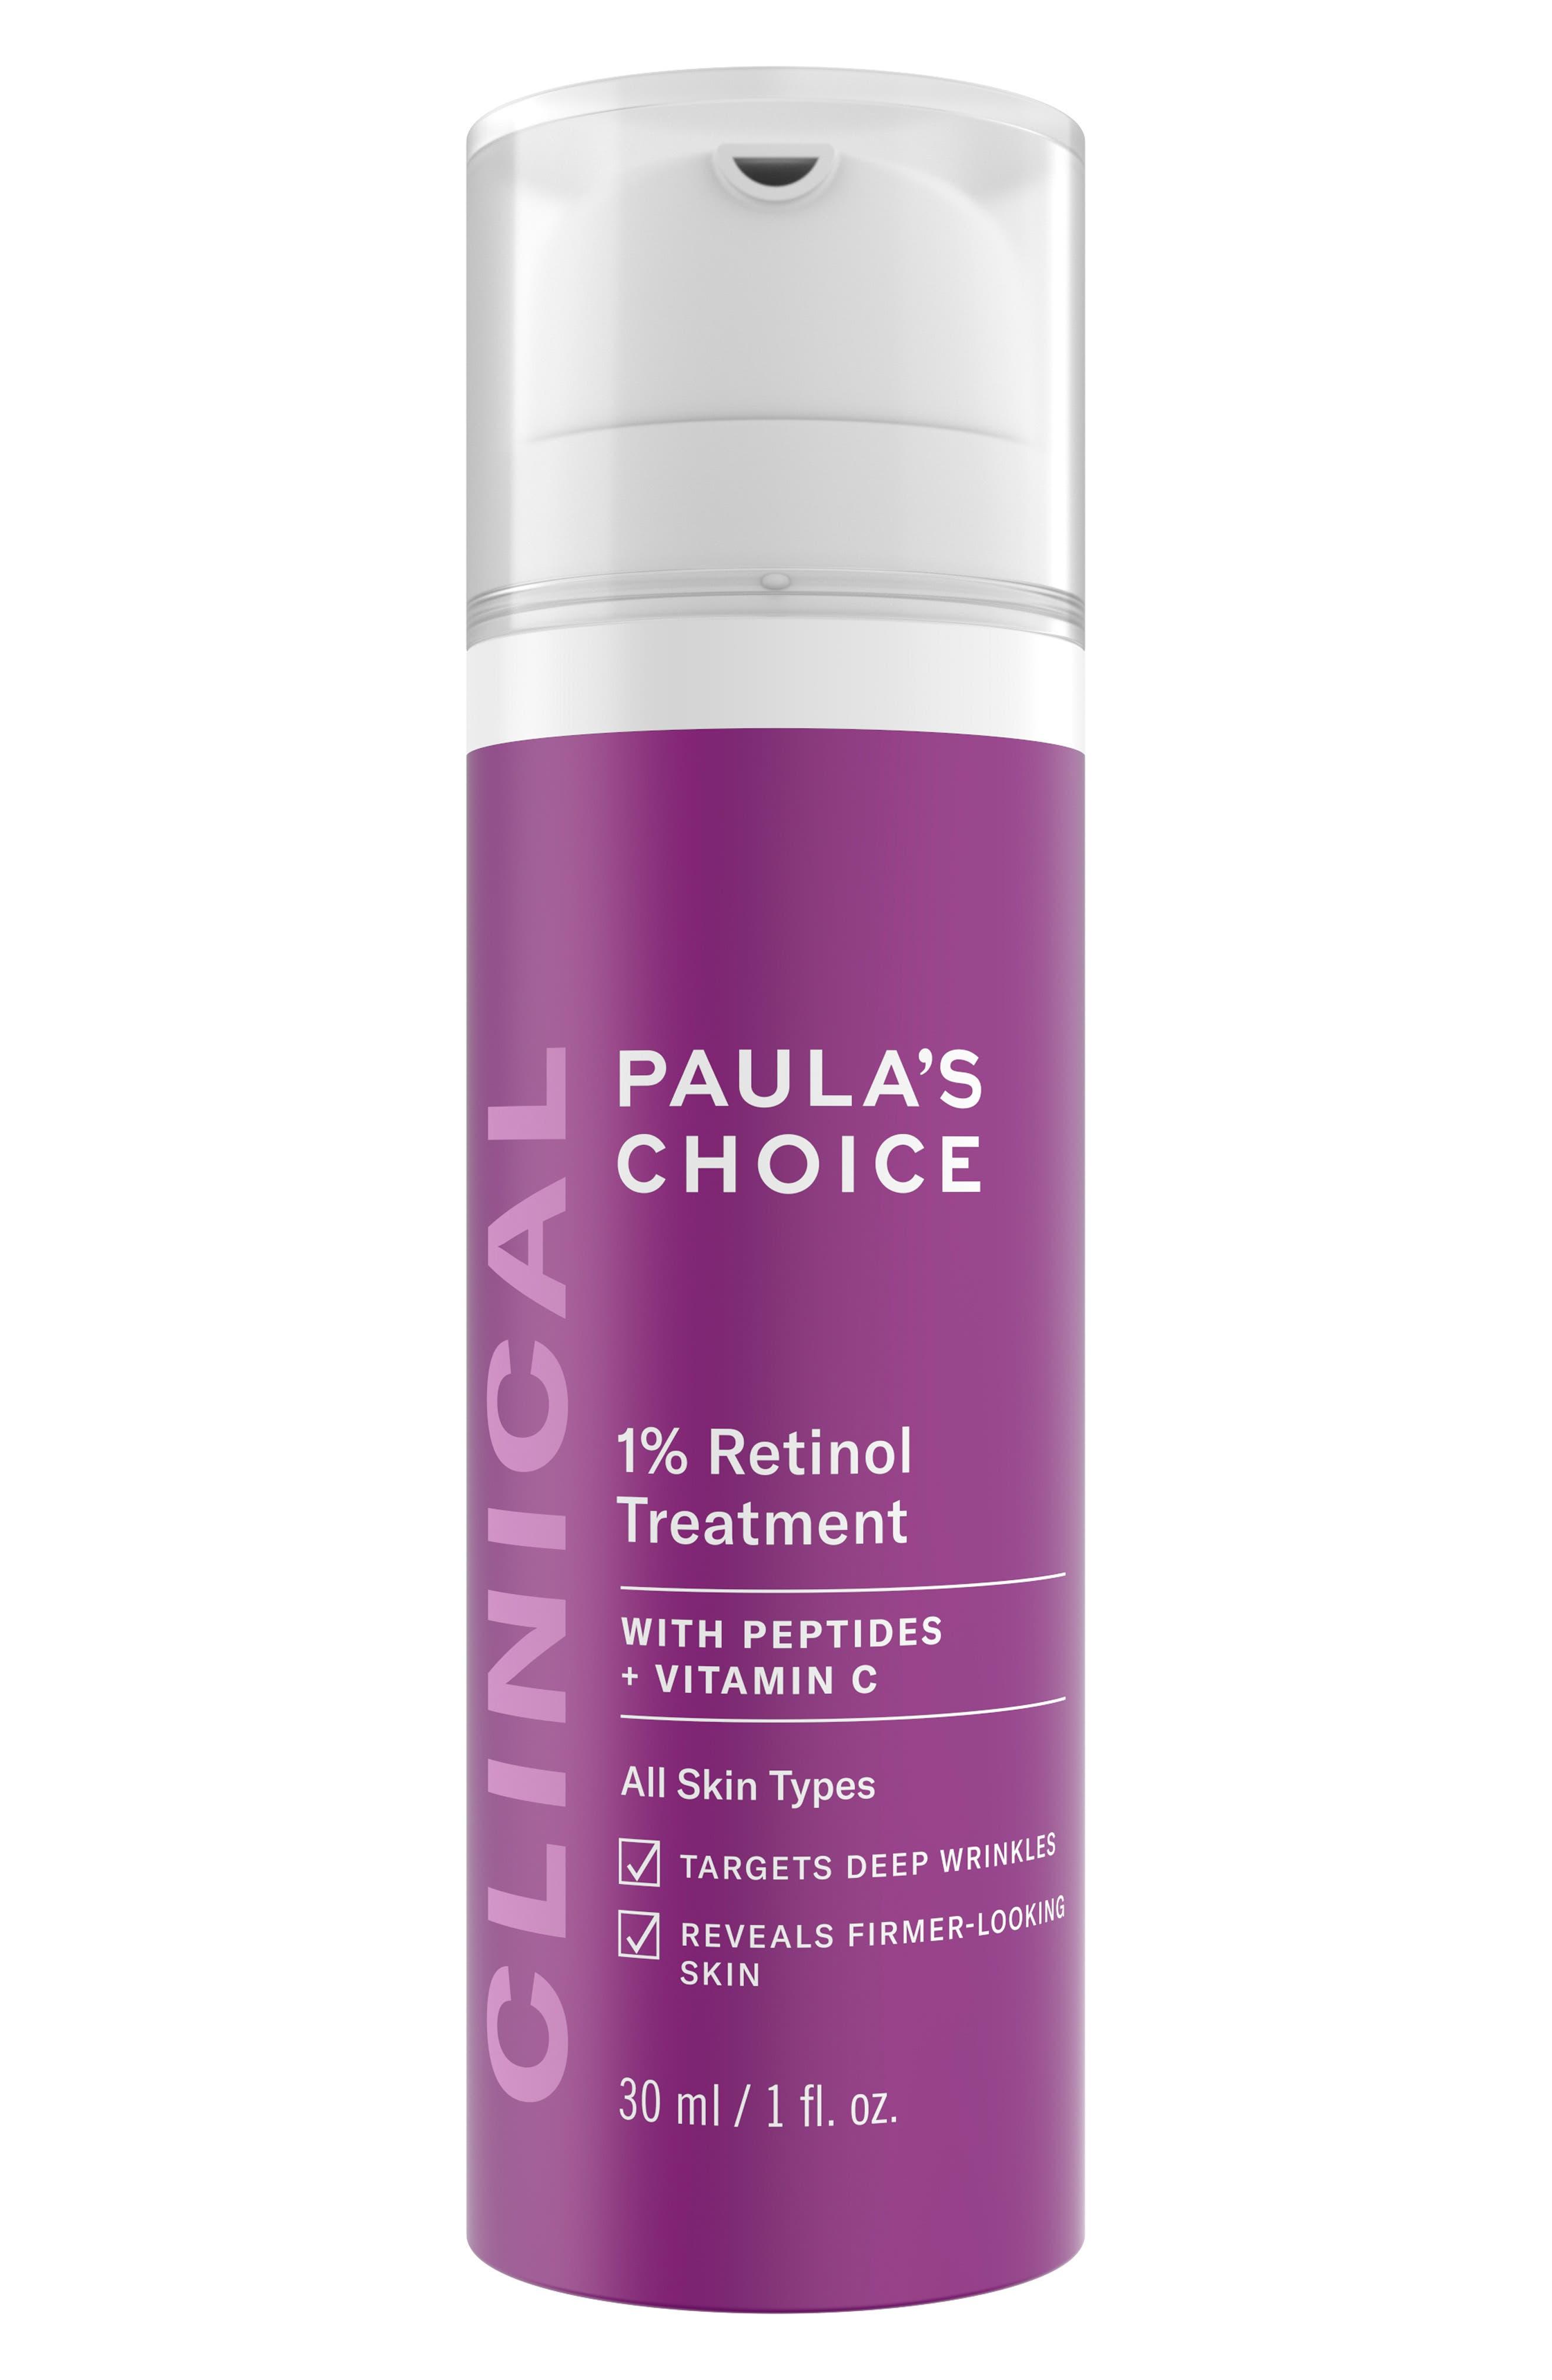 PAULA'S CHOICE Clinical 1% Retinol Treatment Lotion, Main, color, NO COLOR